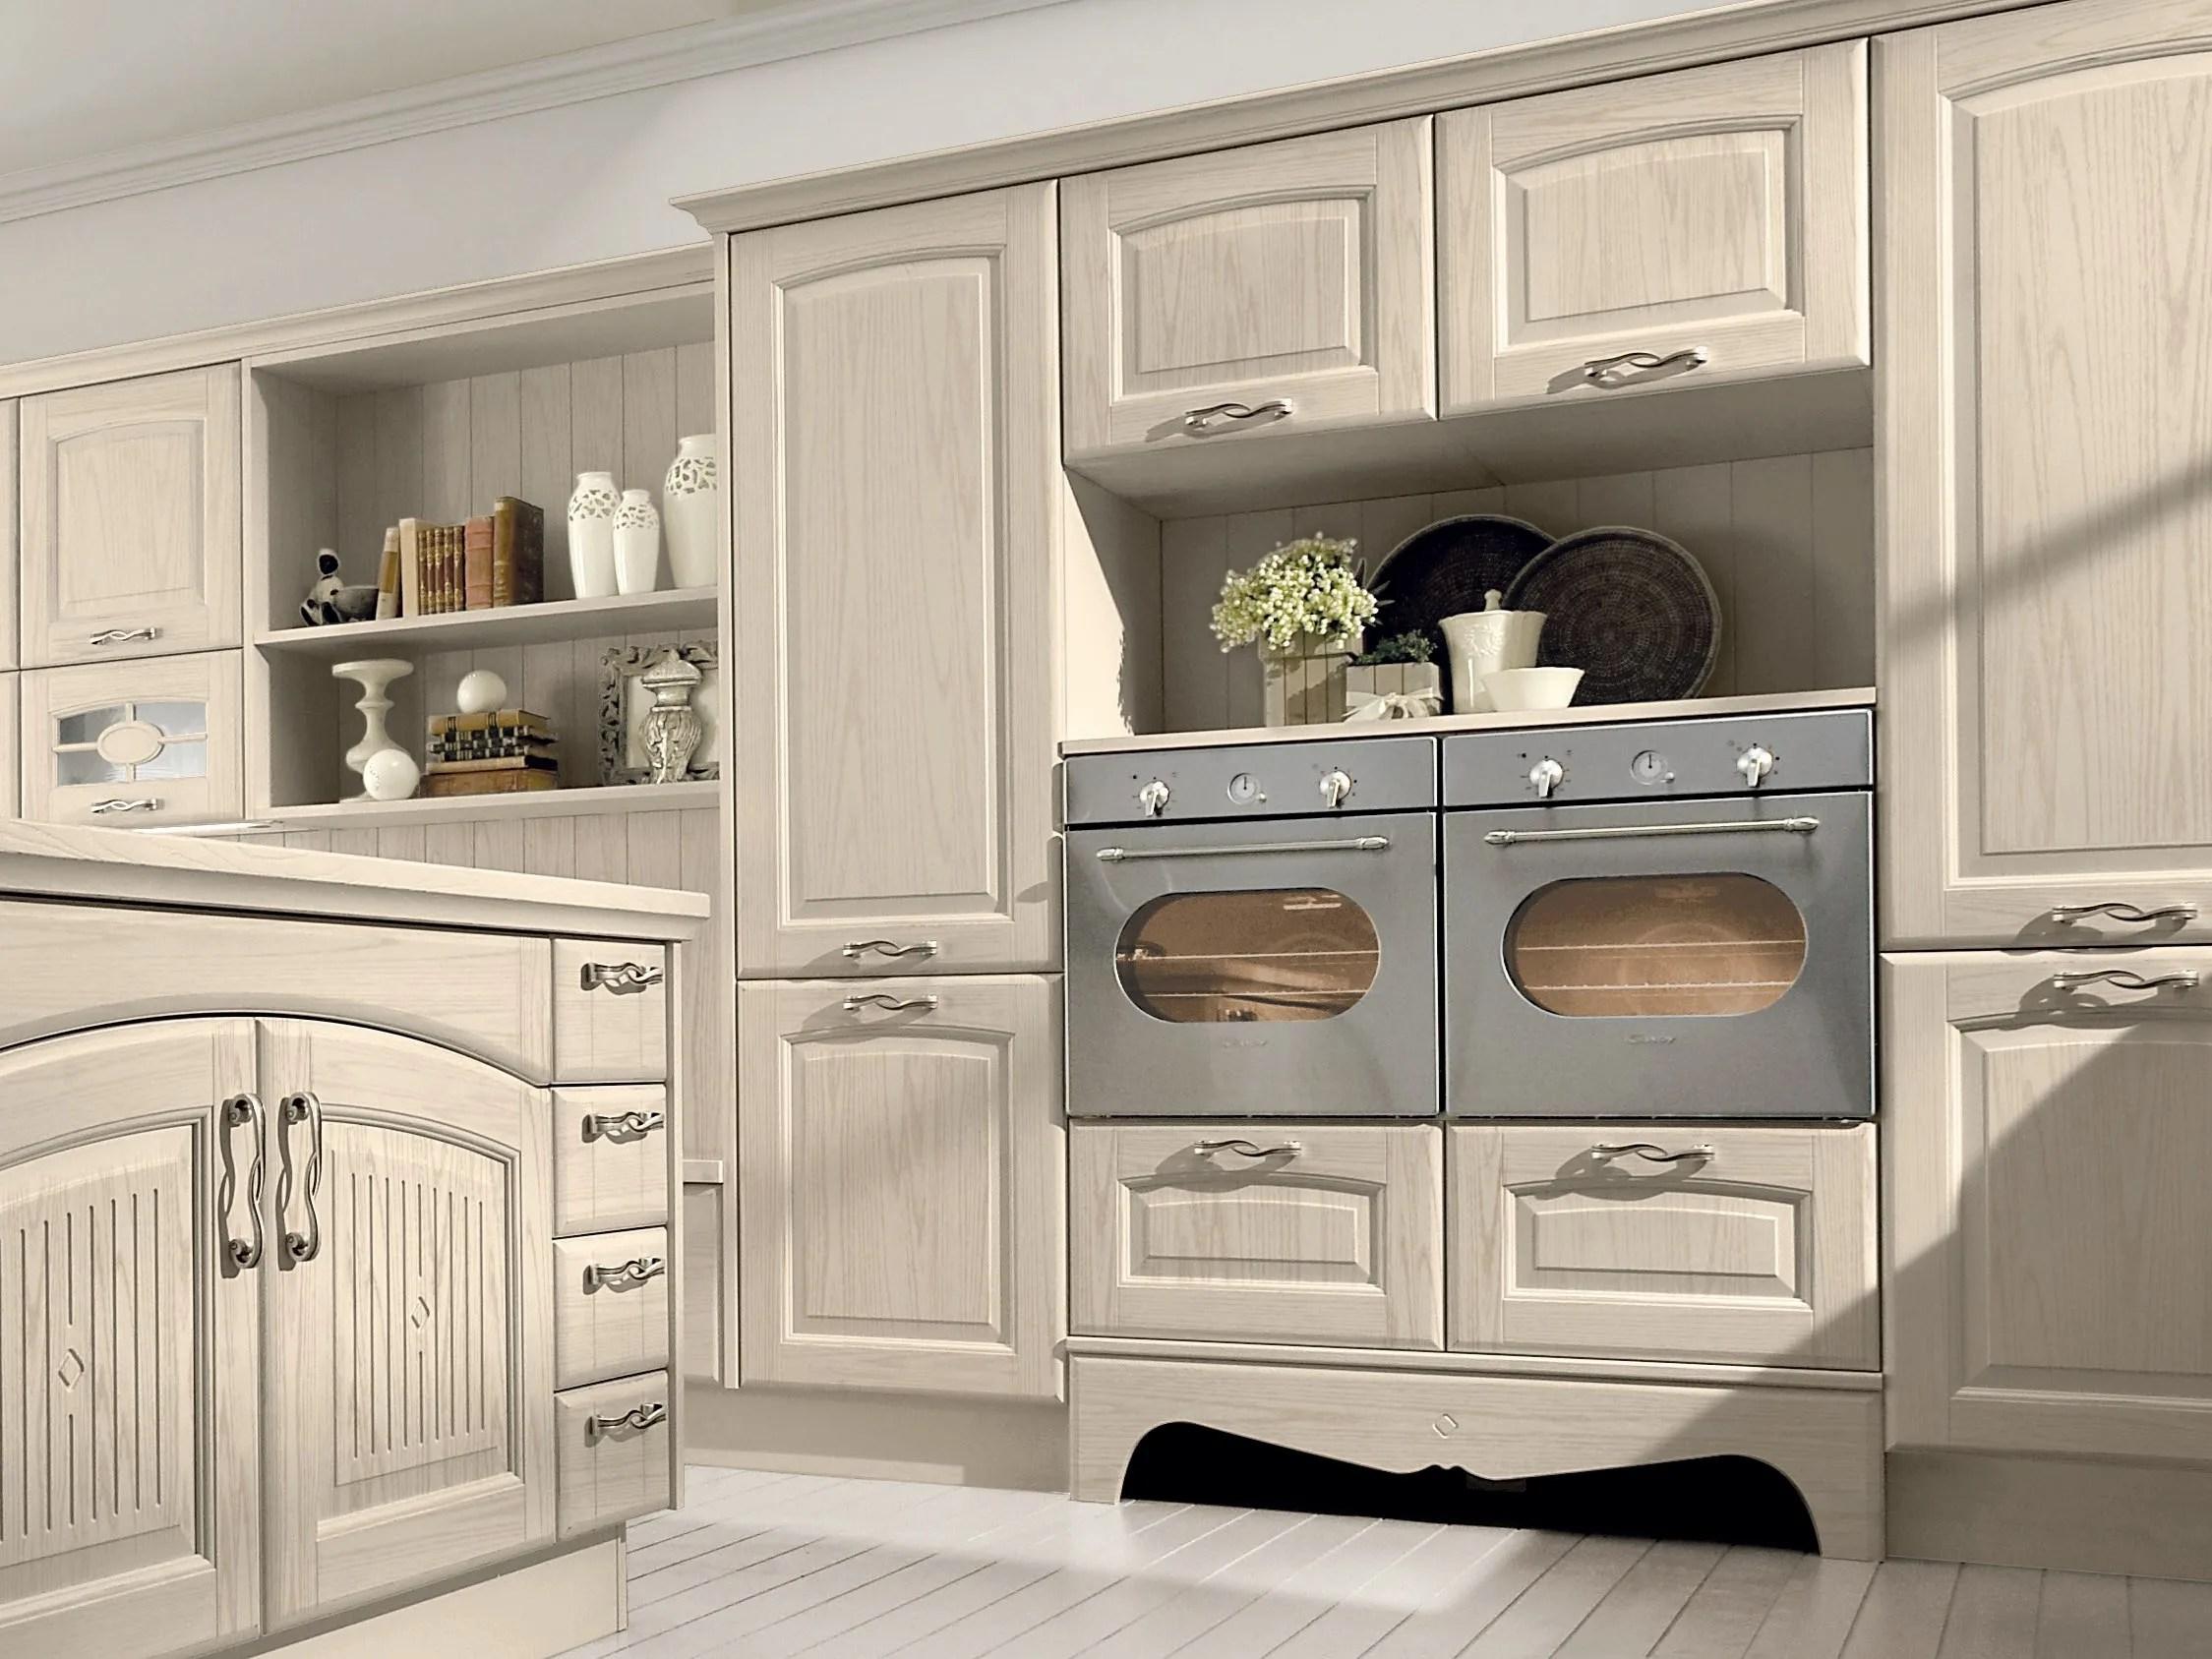 Lube Veronica | Cucine Cucina Lube Mod Veronica